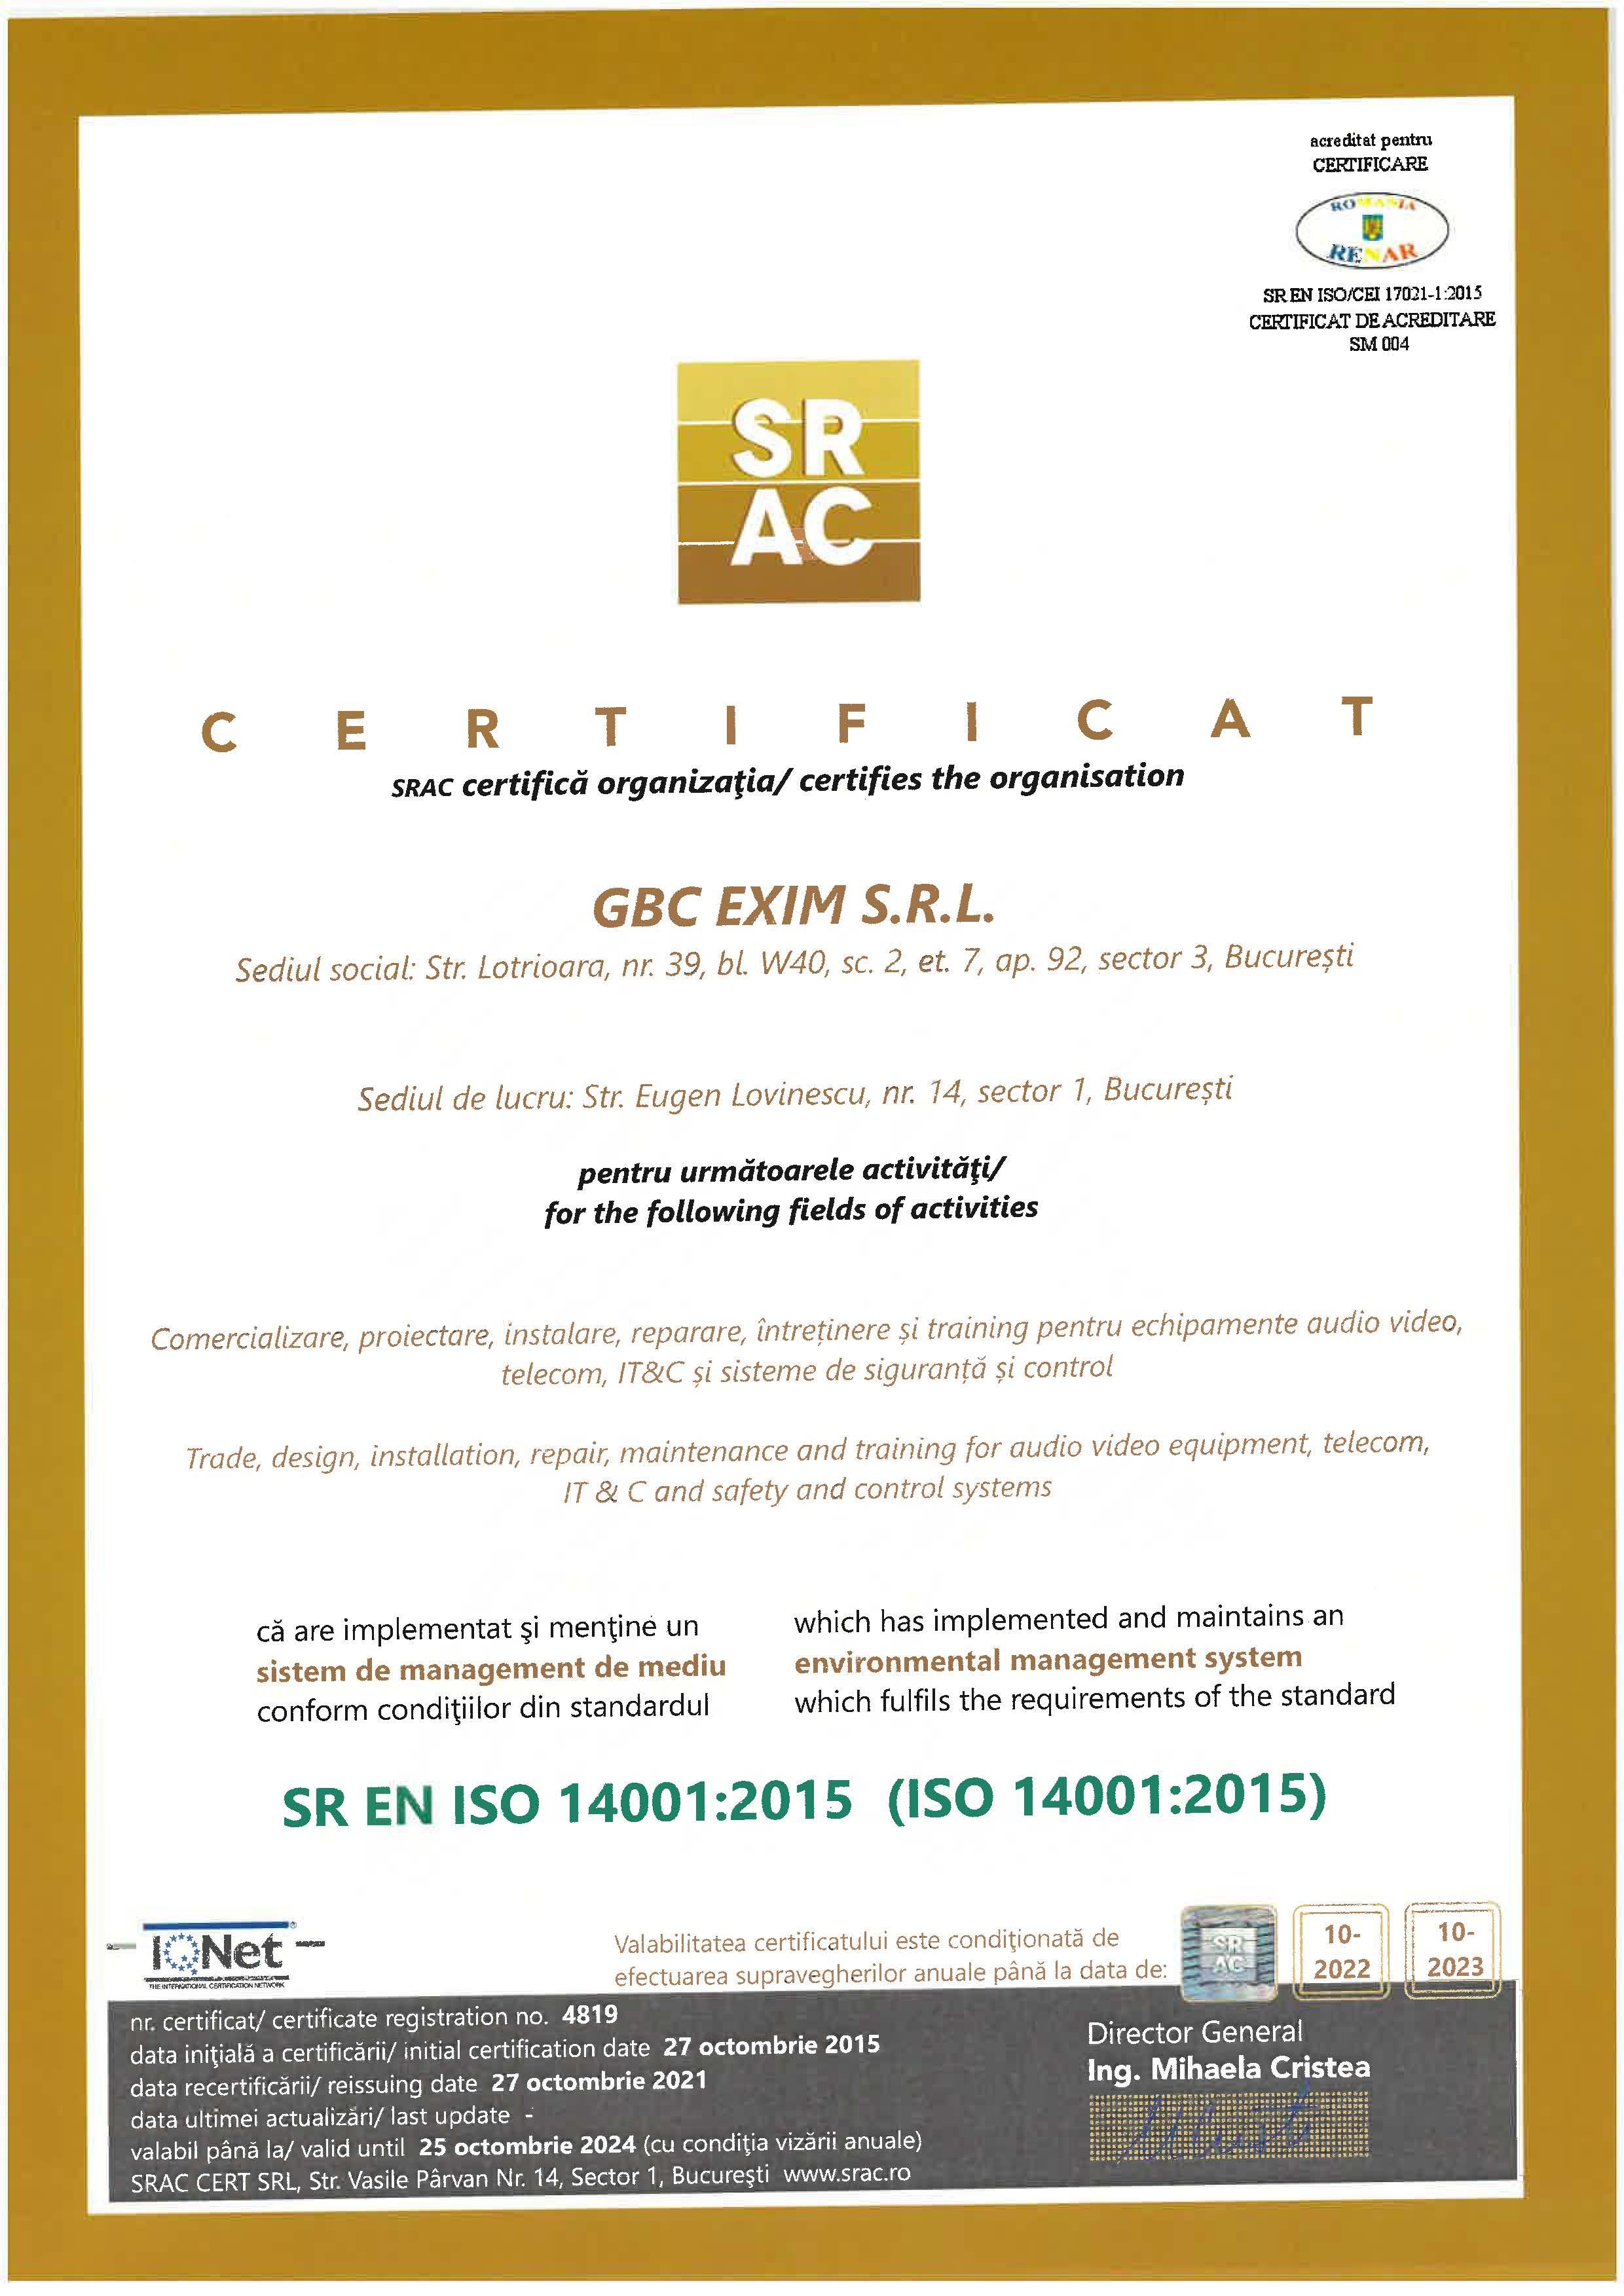 Certificare SR EN ISO 14001:2015